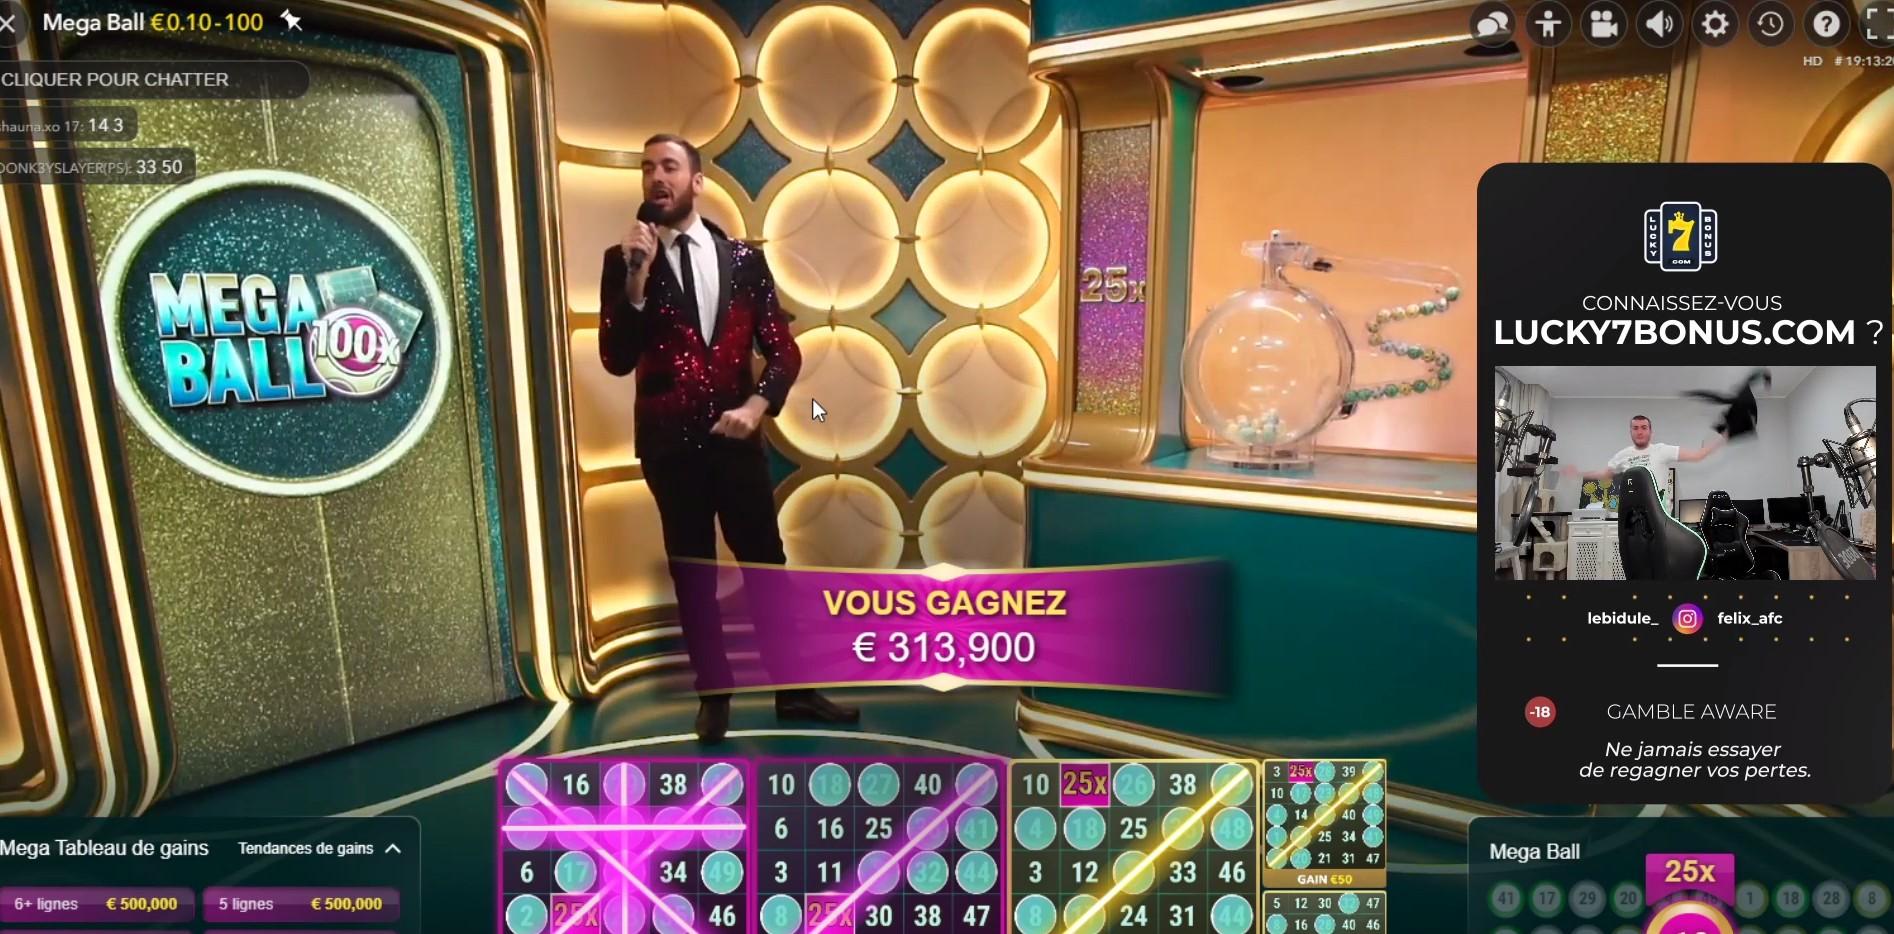 Bidule gagne 300k € au Mega Ball